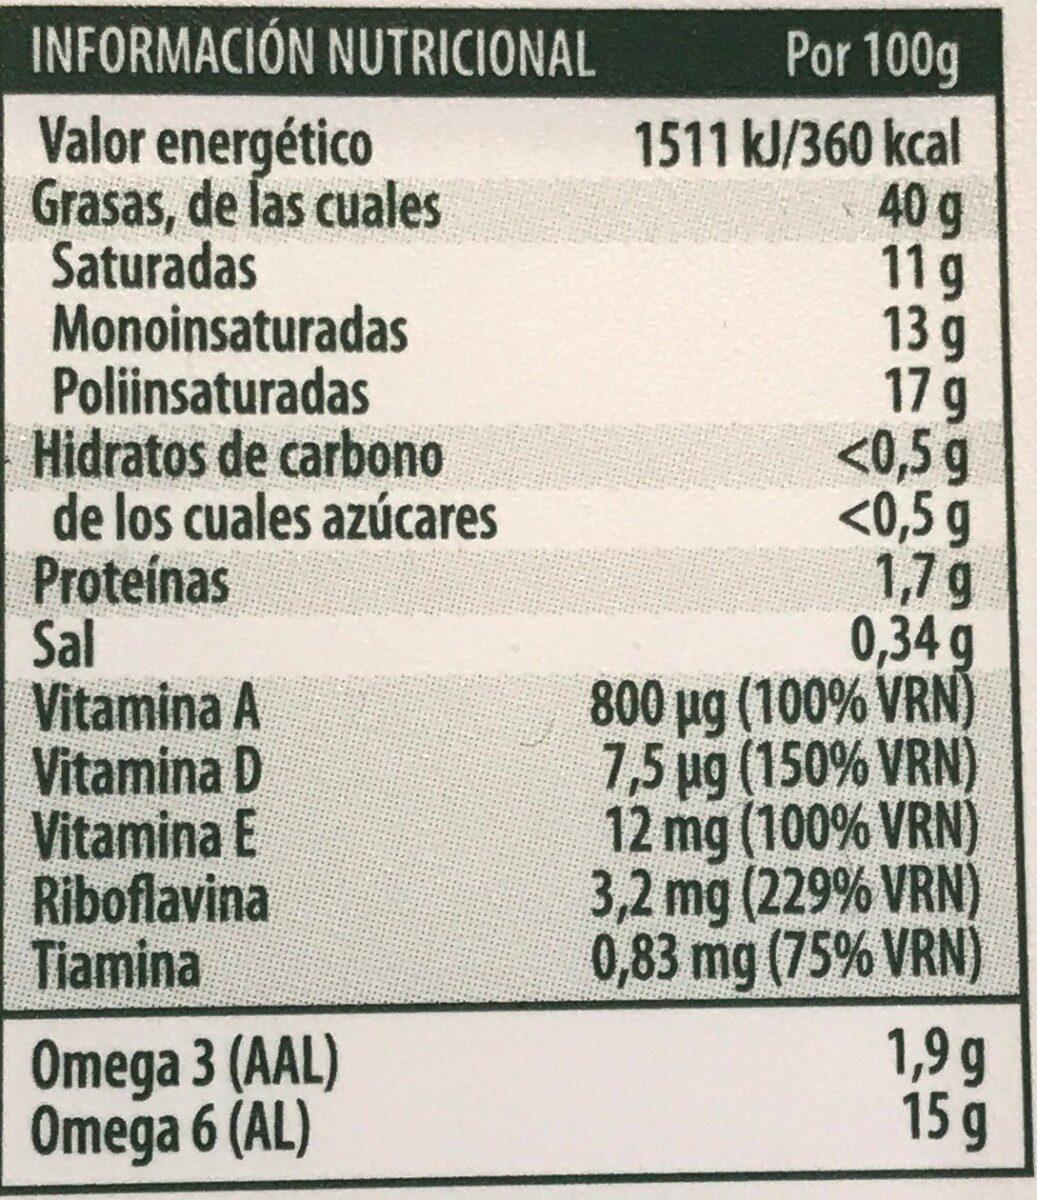 Margarina 100% vegetal con aceite de oliva - Valori nutrizionali - es